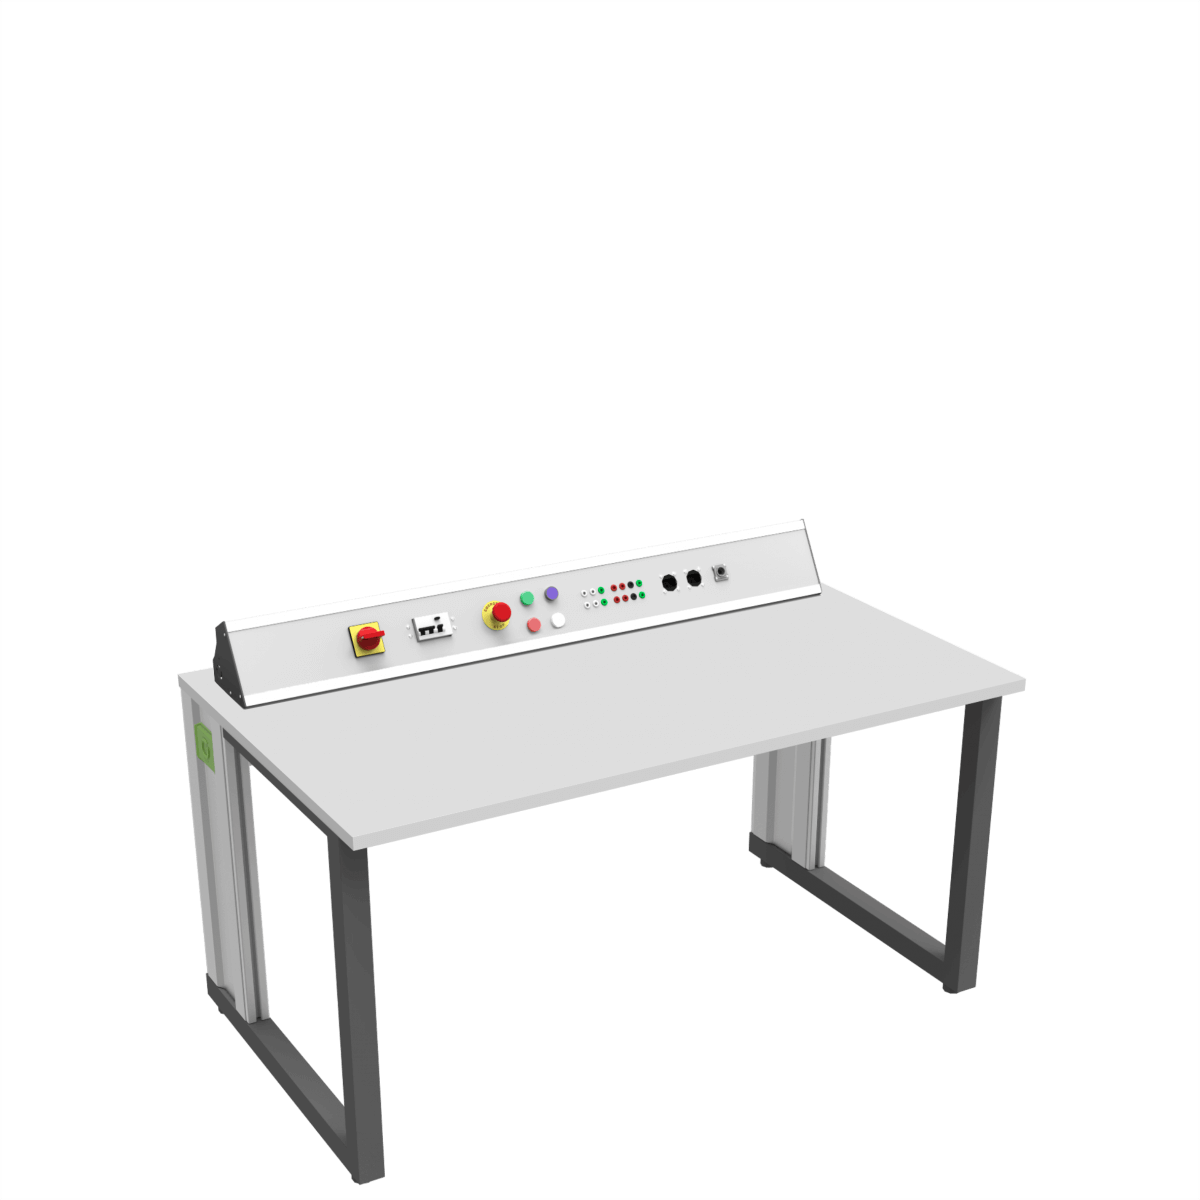 tk-101-auttom-6